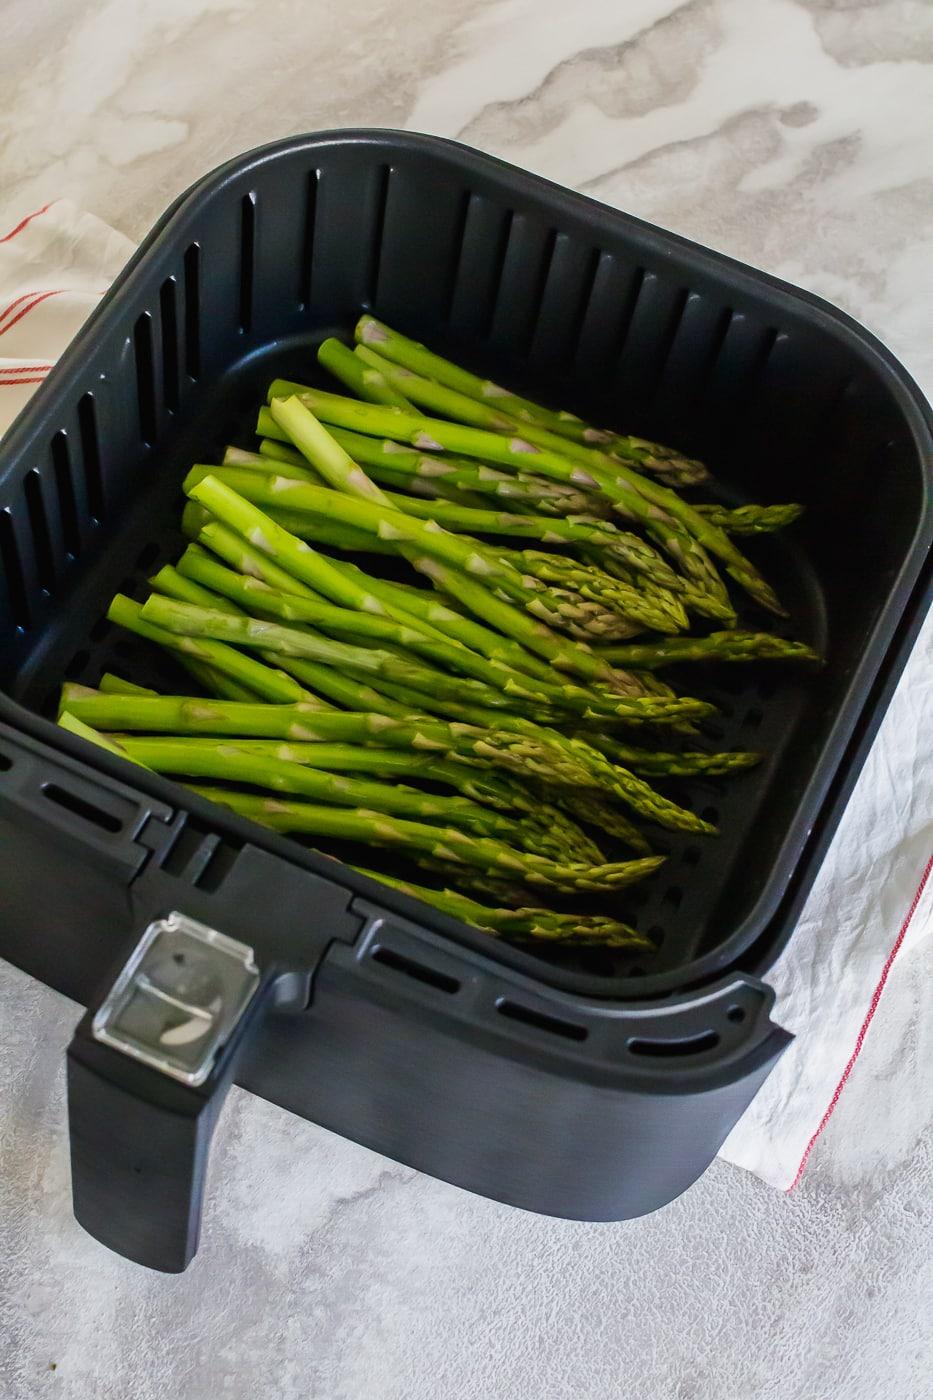 asparagus in the air fryer basket